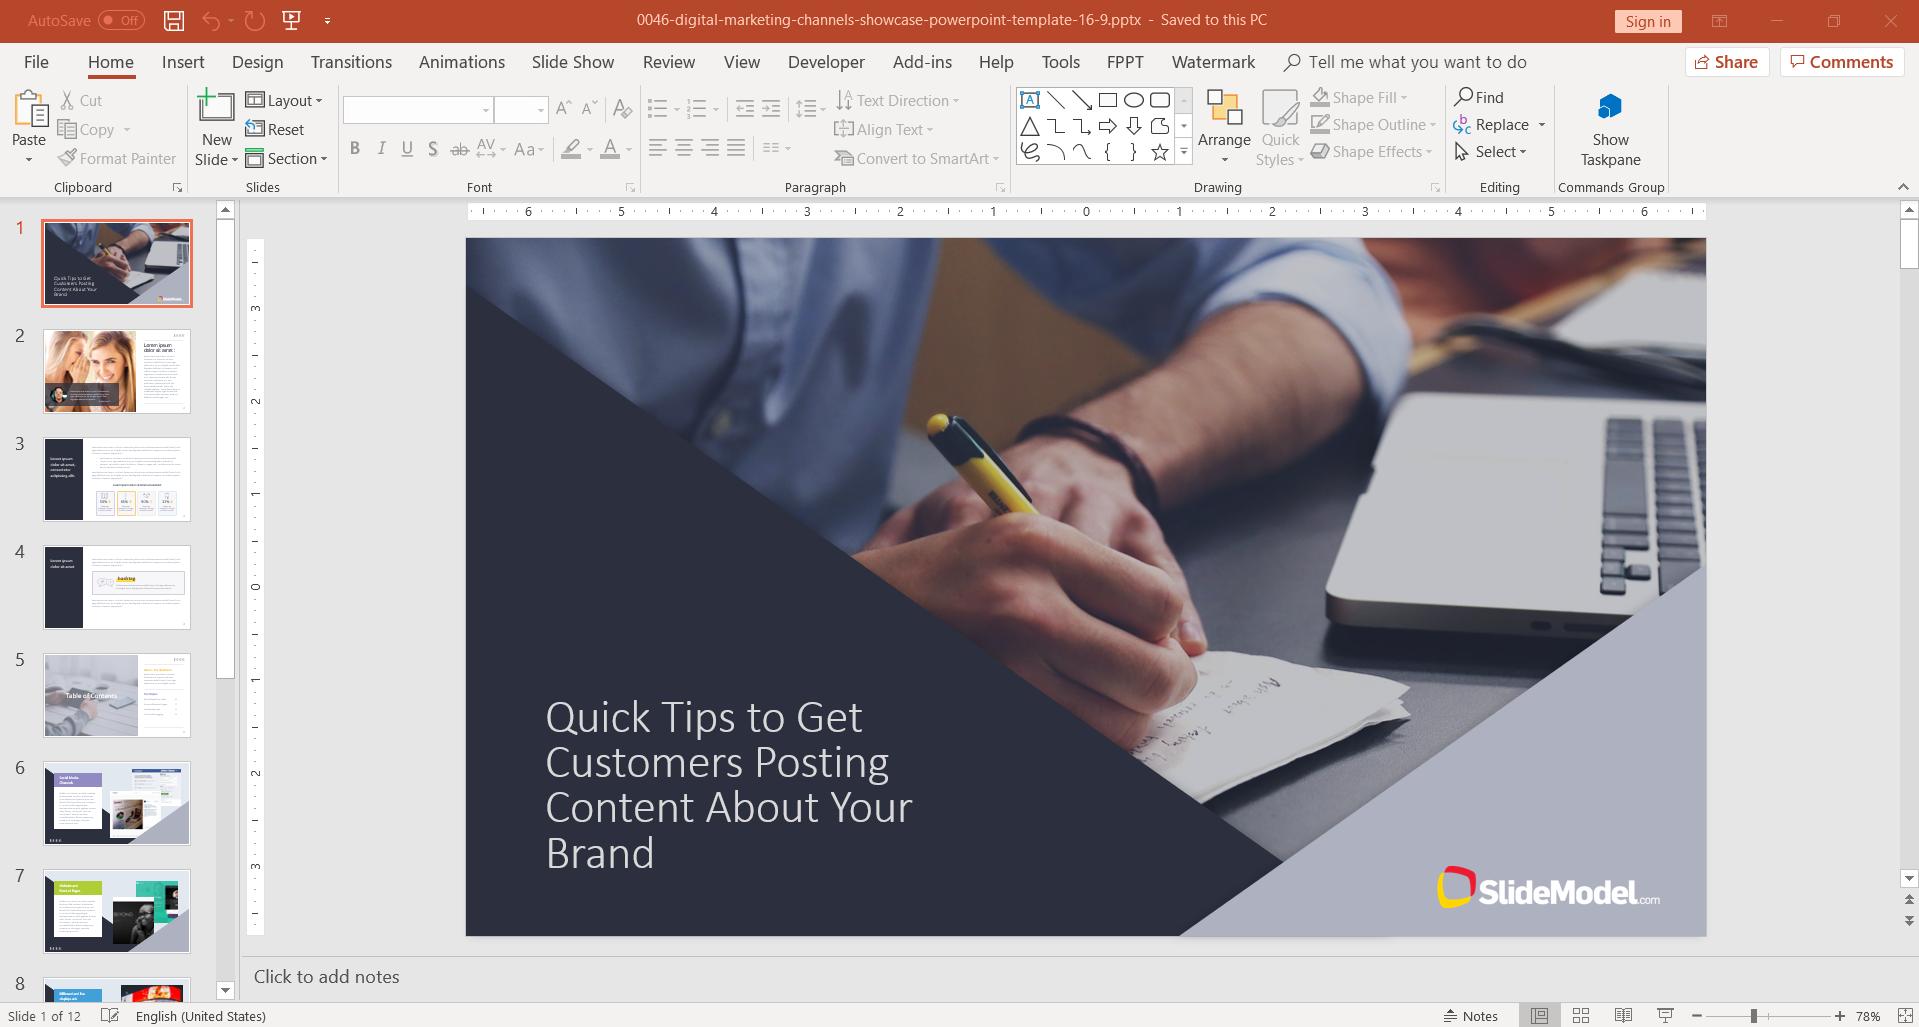 digital-marketing-powerpoint-template - FPPT